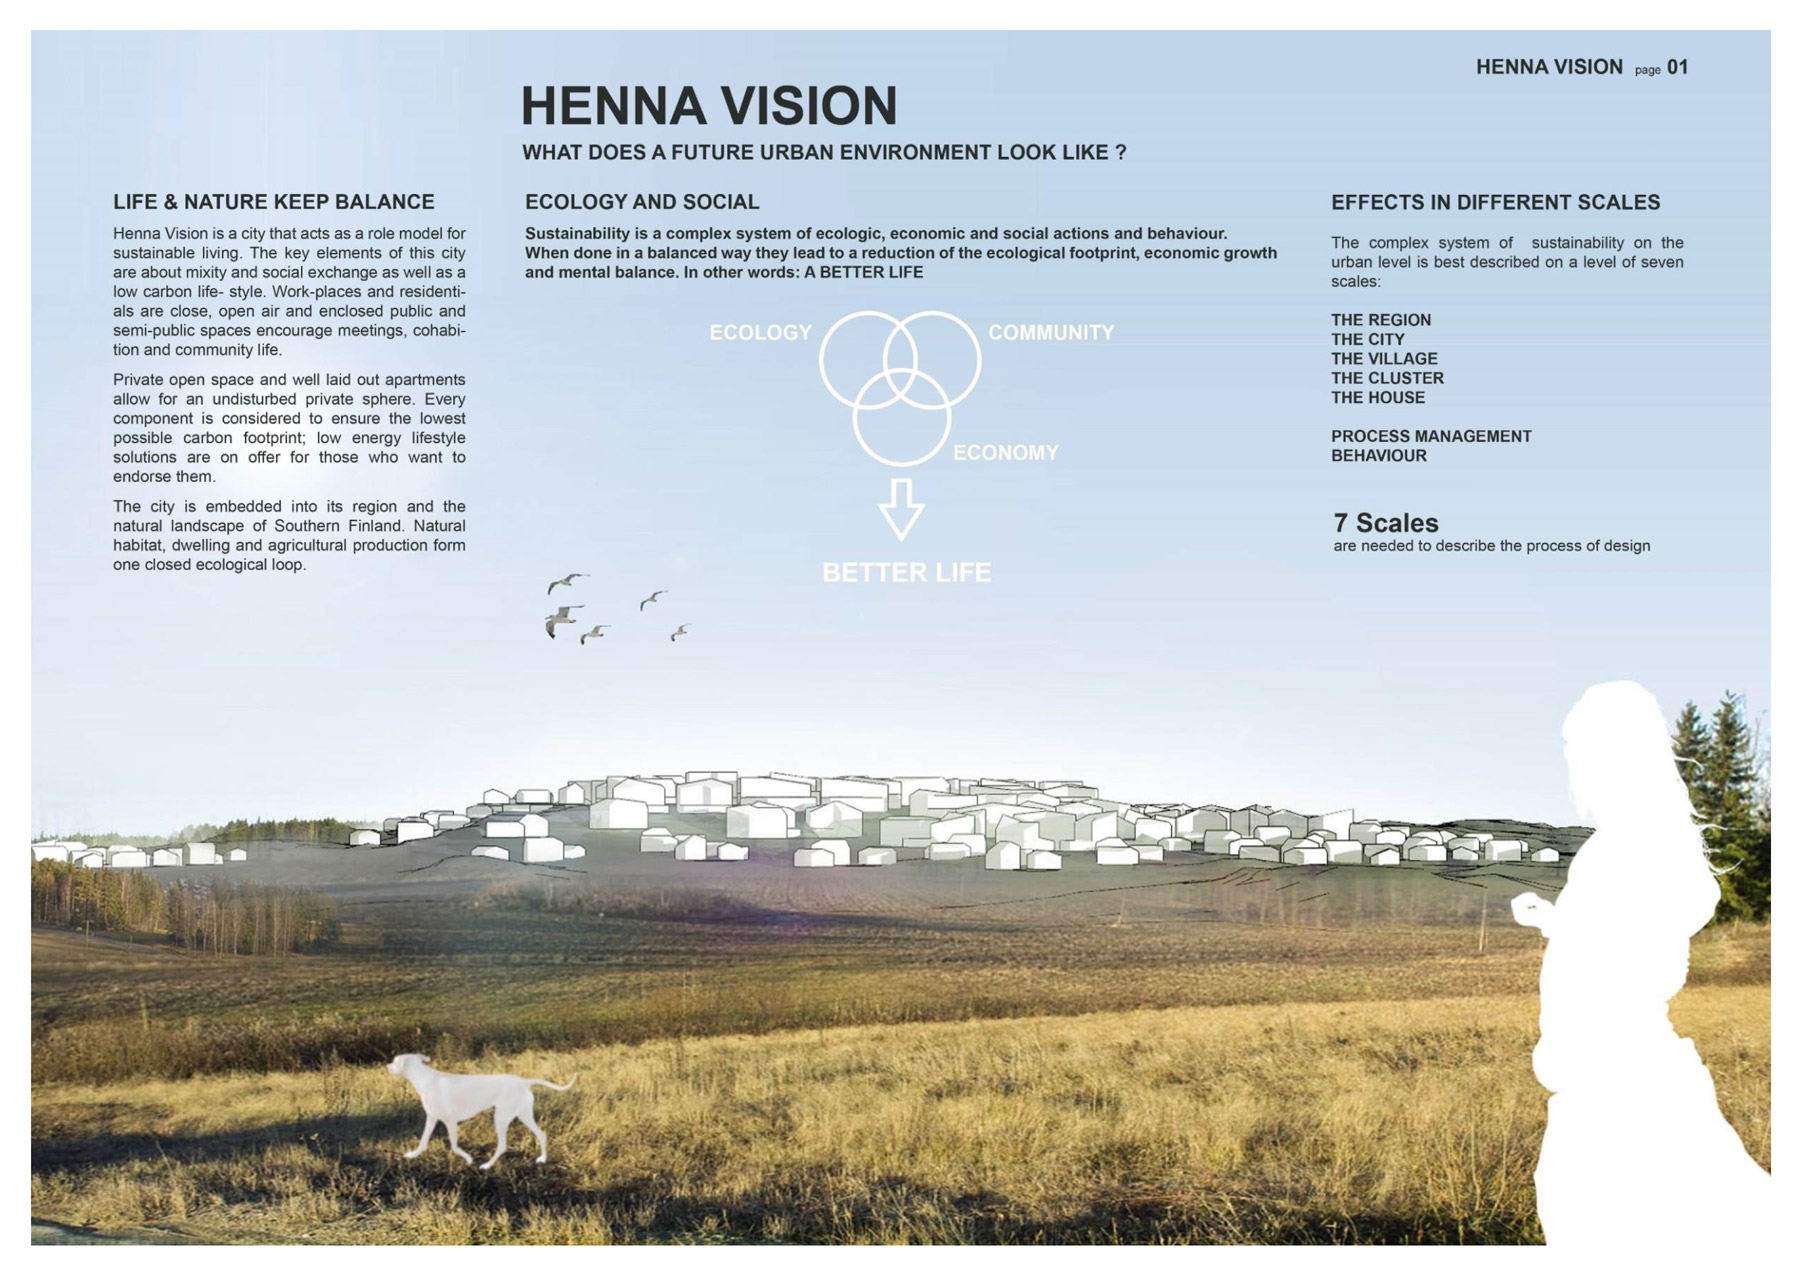 077_Henna_Vision_Slide_04